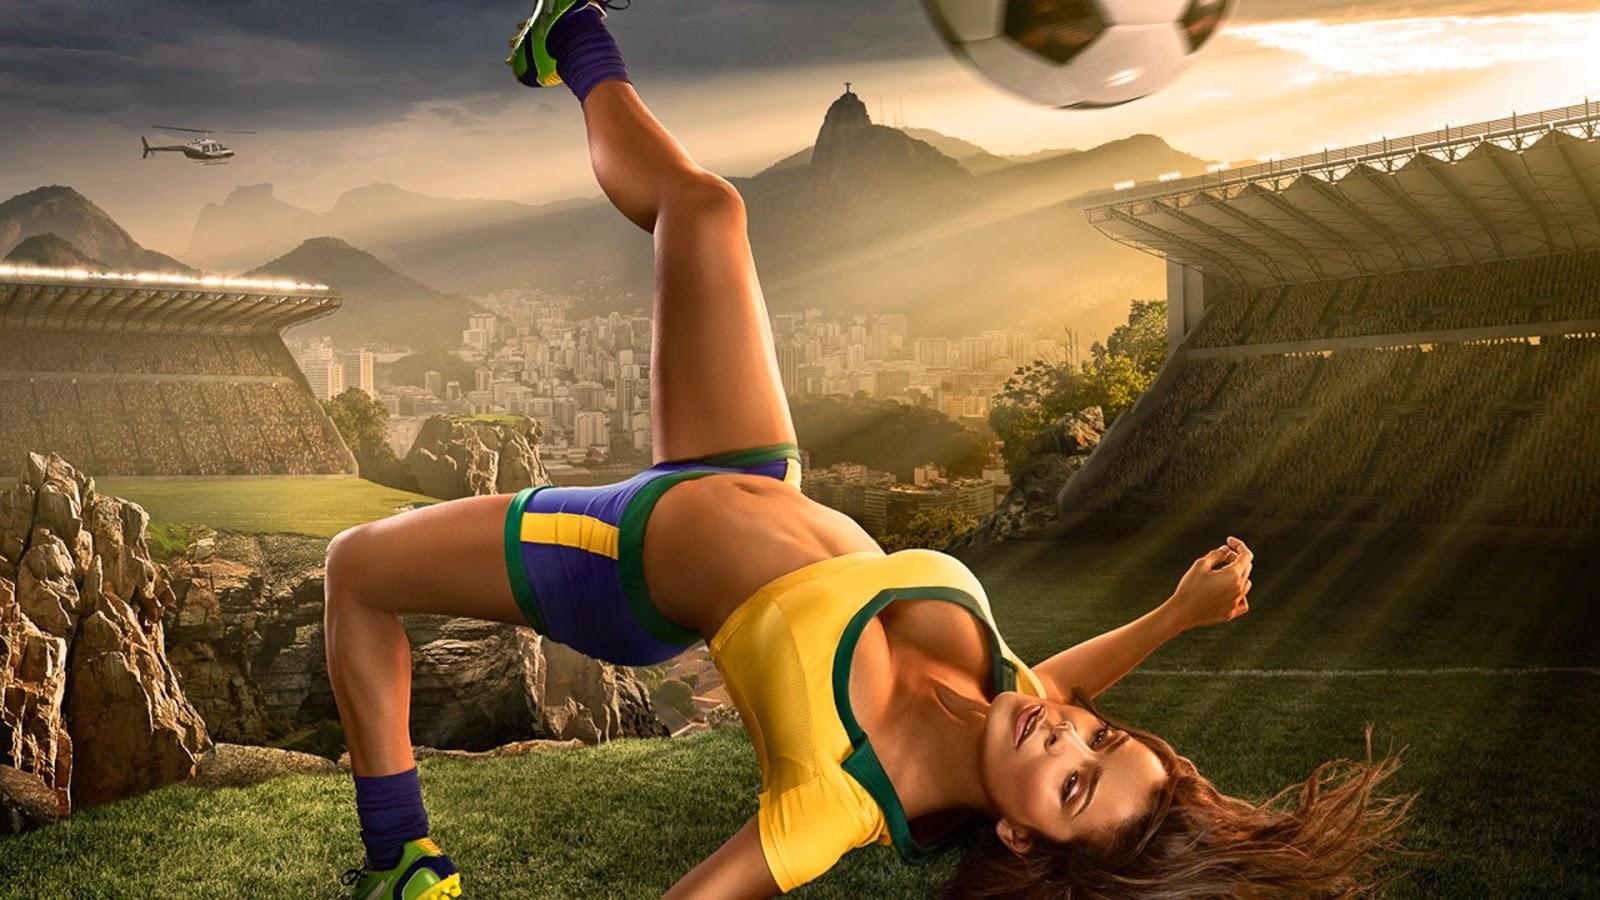 Brazil World Cup 2014 Football Baby Sexy Wallpaper - Hd -1515